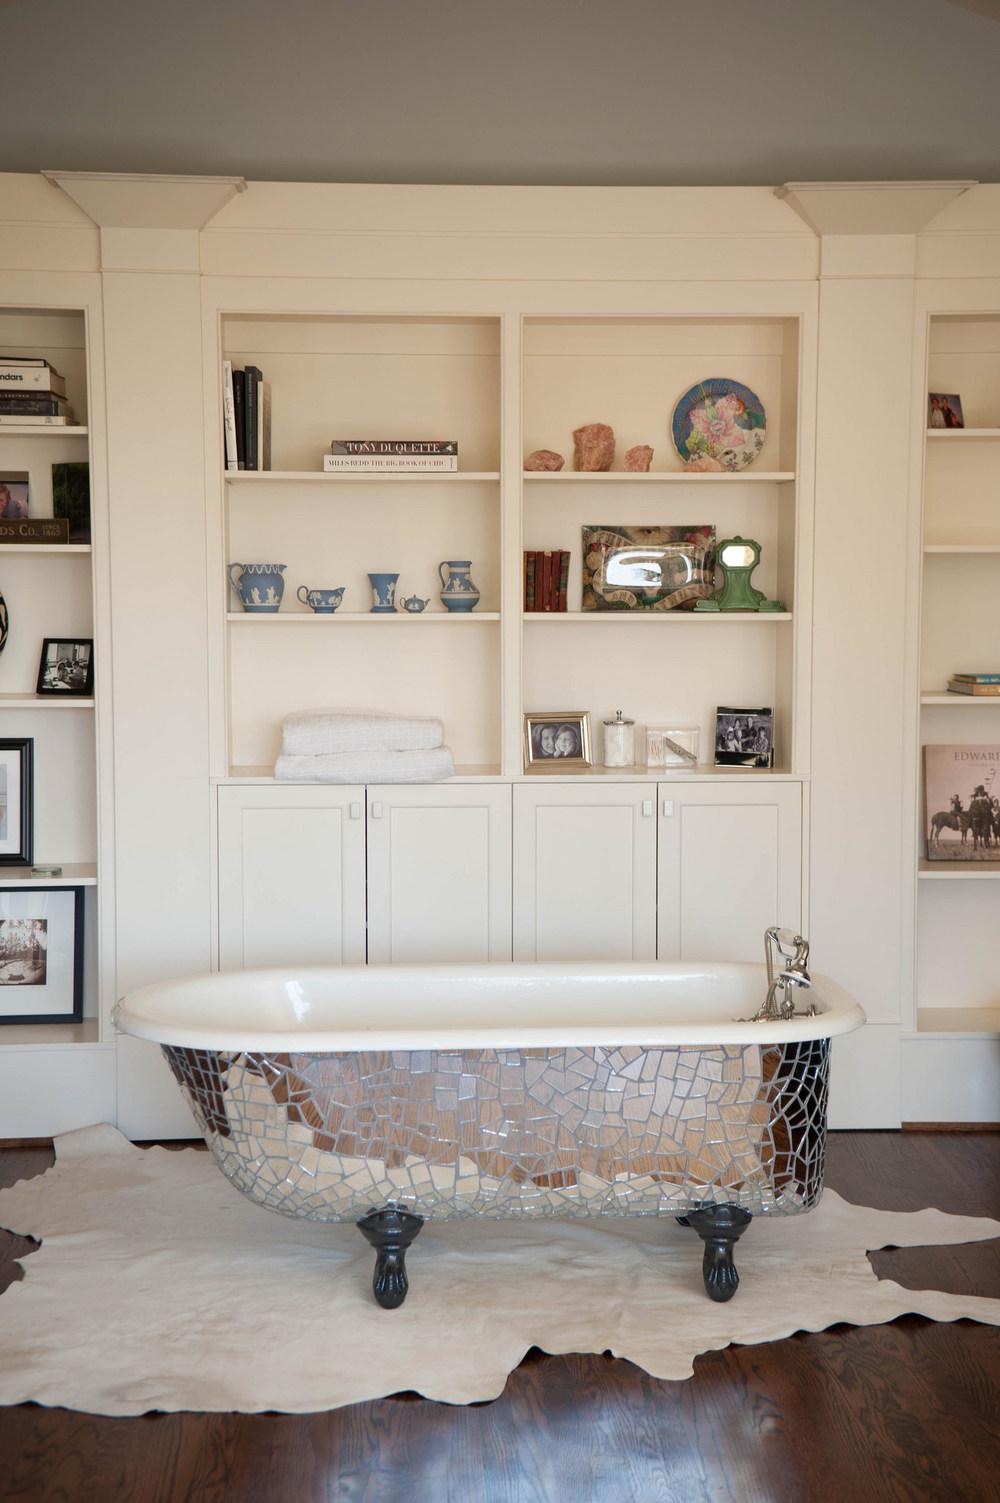 Mirrored mosaic clawfoot tub